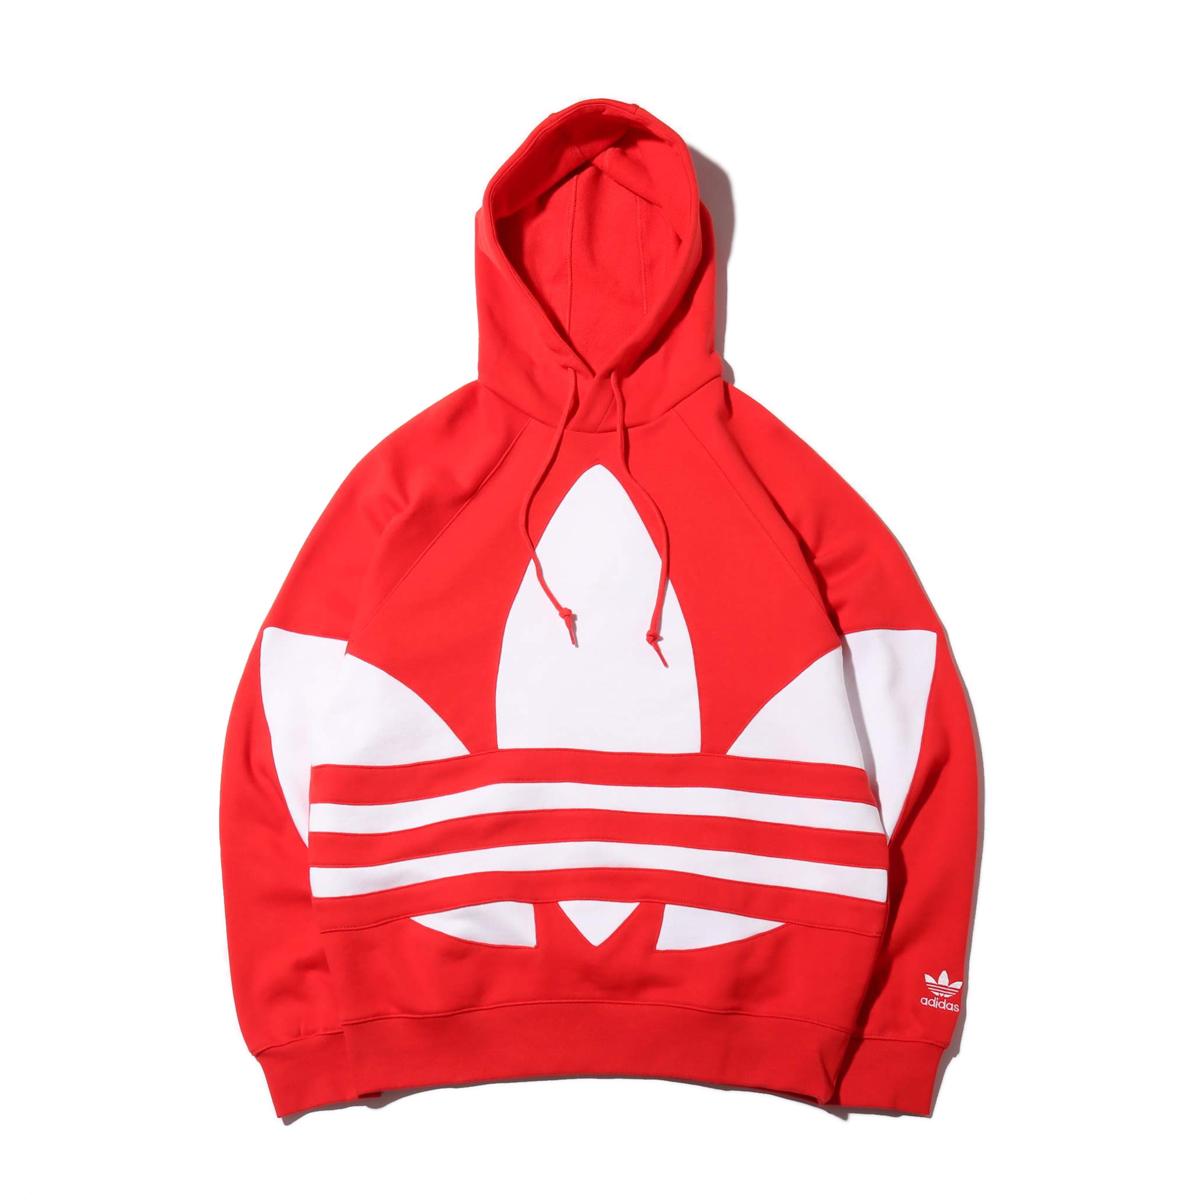 adidas BIG TREFOIL HOODIE(アディダス ビッグ トレフォイル フーディー)LUSH RED【メンズ パーカー】20SS-I